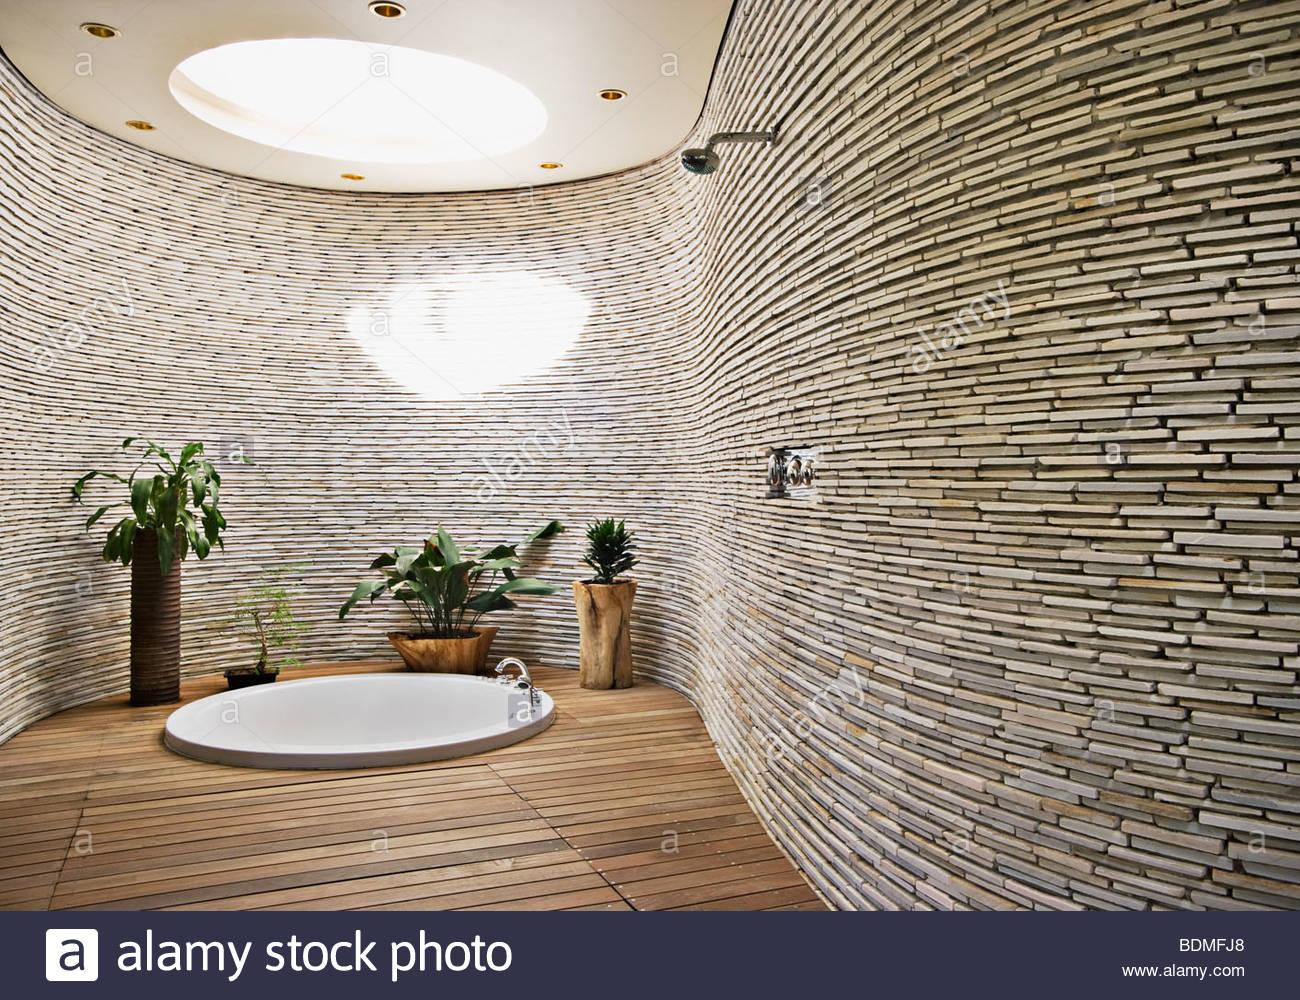 Sunken Bathtub Stock Photos & Sunken Bathtub Stock Images - Alamy on bathroom designs with tub shower combos, bathroom garden tub decorating ideas, bathroom with corner jacuzzi tub, bathroom design with whirlpool tub, bathroom design with clawfoot tub, bathroom remodel with corner tub, bathroom design ideas, bathroom design trends 2015, bathroom jacuzzi decorating ideas, bathroom shower soaking tub, tuscan sun spa hot tub, bathroom design with black tub, bathroom floor tile ideas, bathroom garden tub decor ideas, bathroom corner tub with shower ideas, master bathroom design with soaking tub, bathroom designs corner bath tubs, bathroom wall for tv,